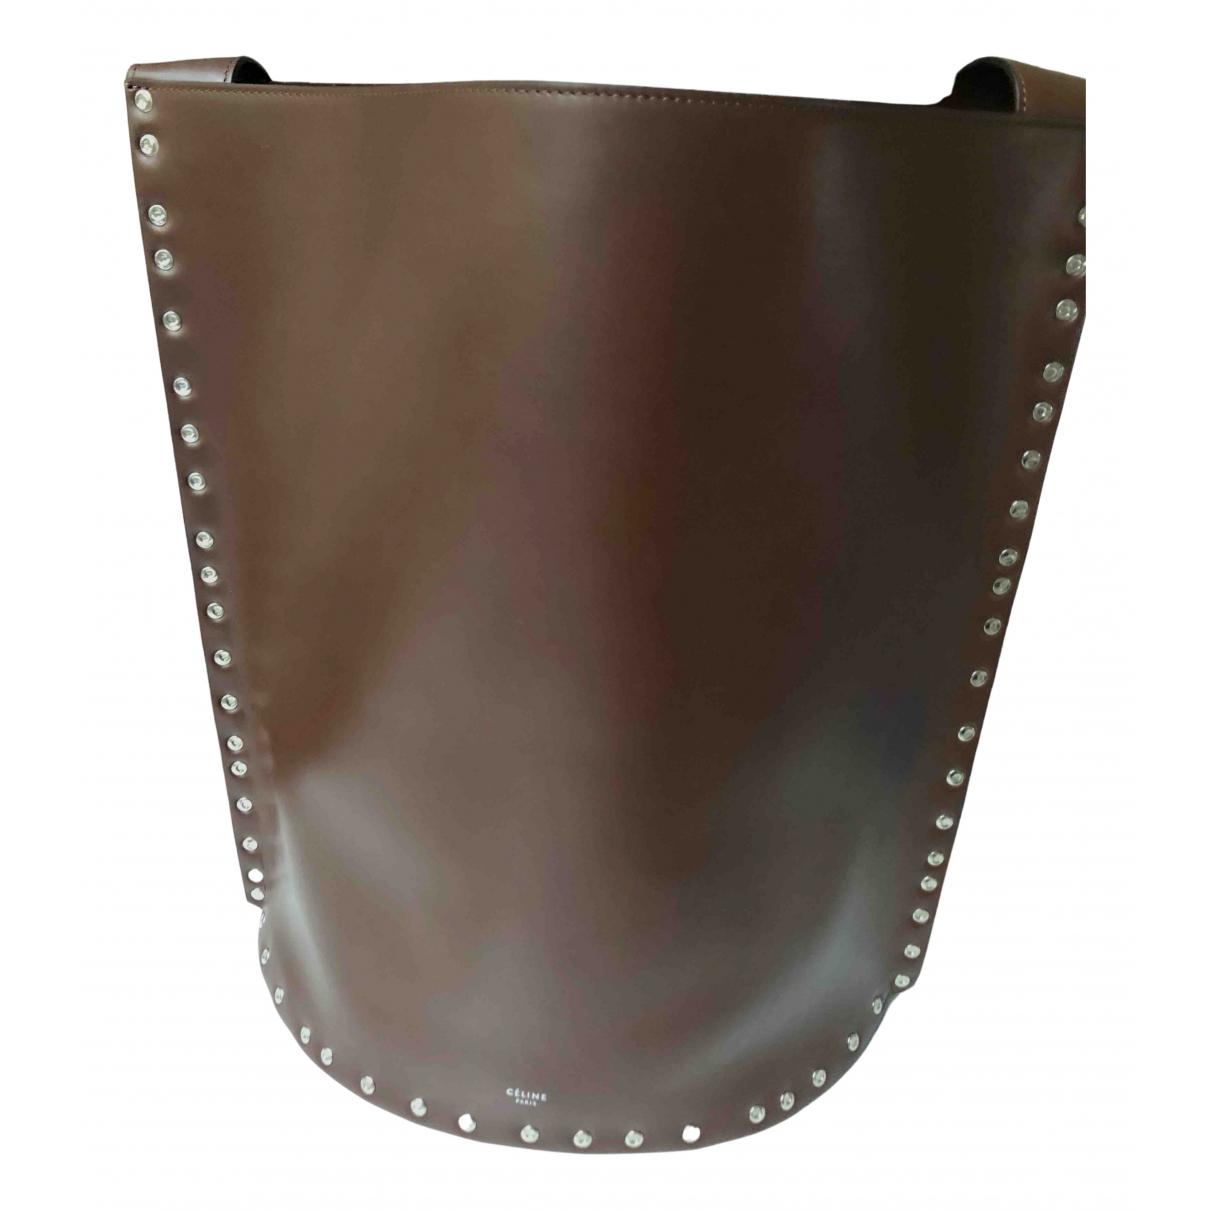 Celine Seau Sangle Handtasche in  Braun Leder